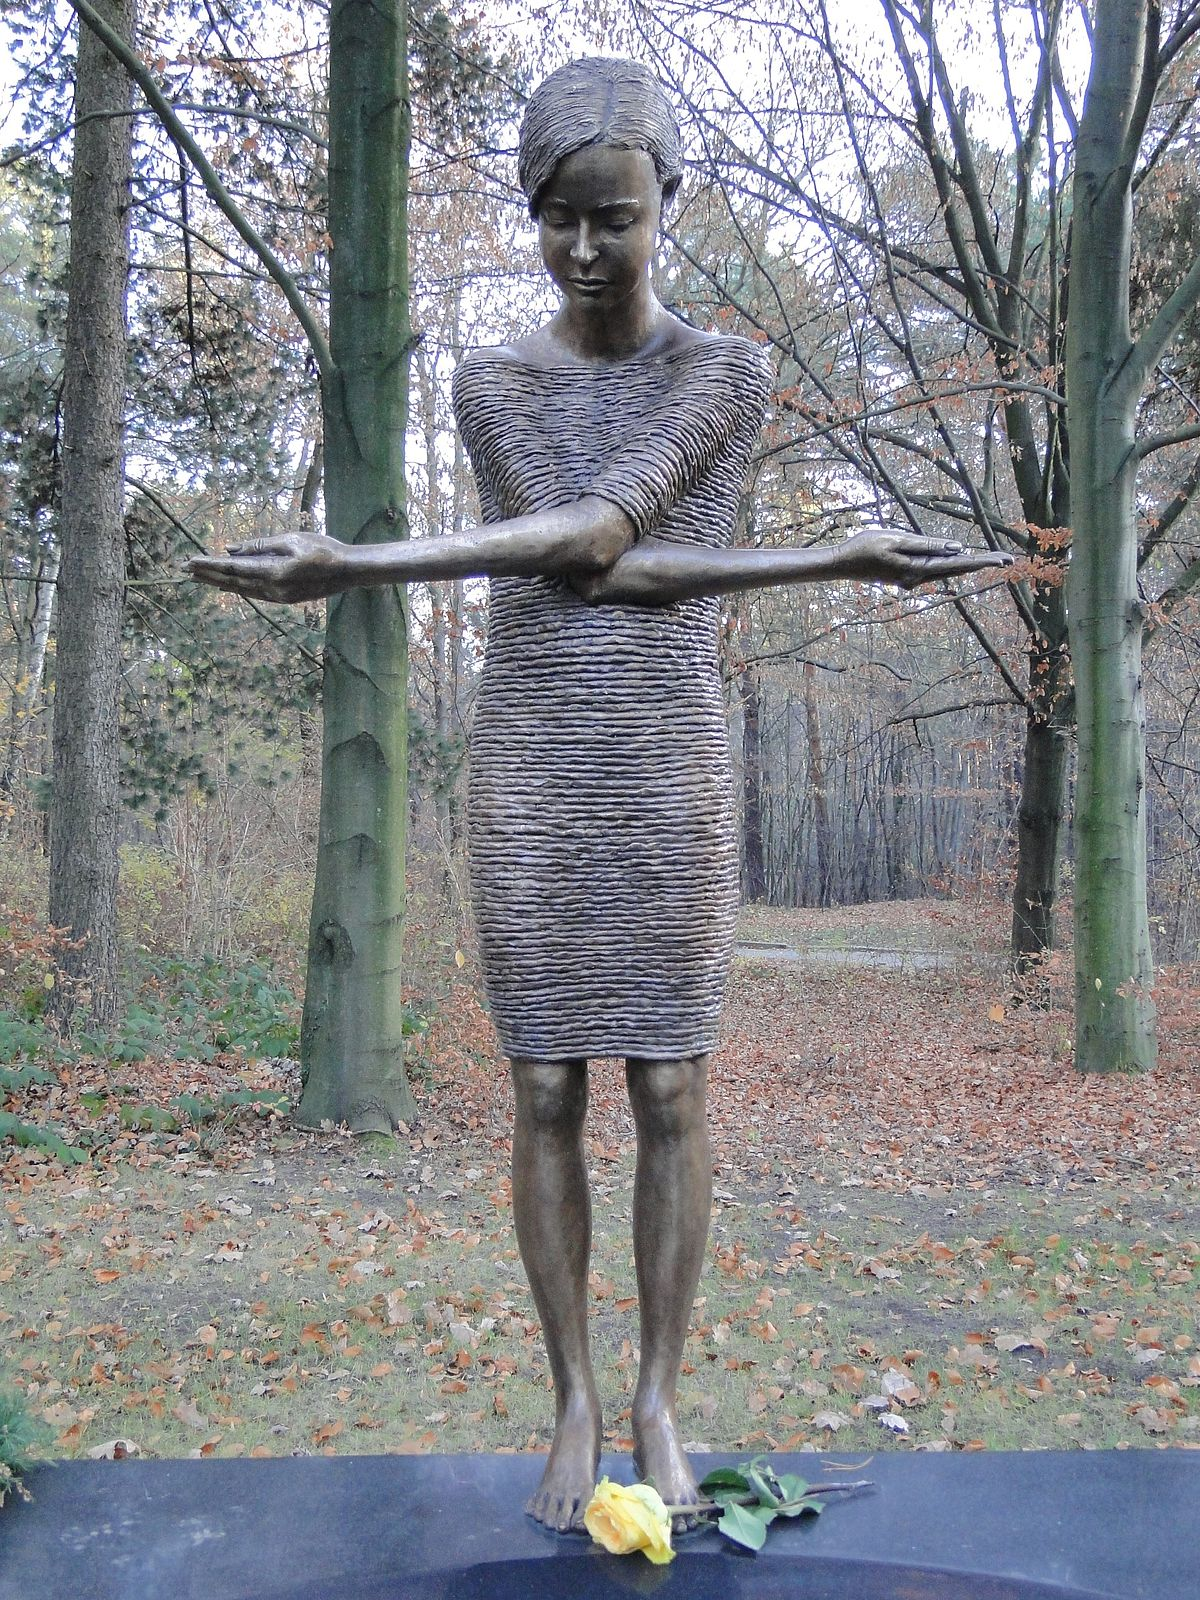 File:Malgorzata Chodakowska - Trauerndes Mädchen am Tränenmeer Detail.JPG -  Wikimedia Commons